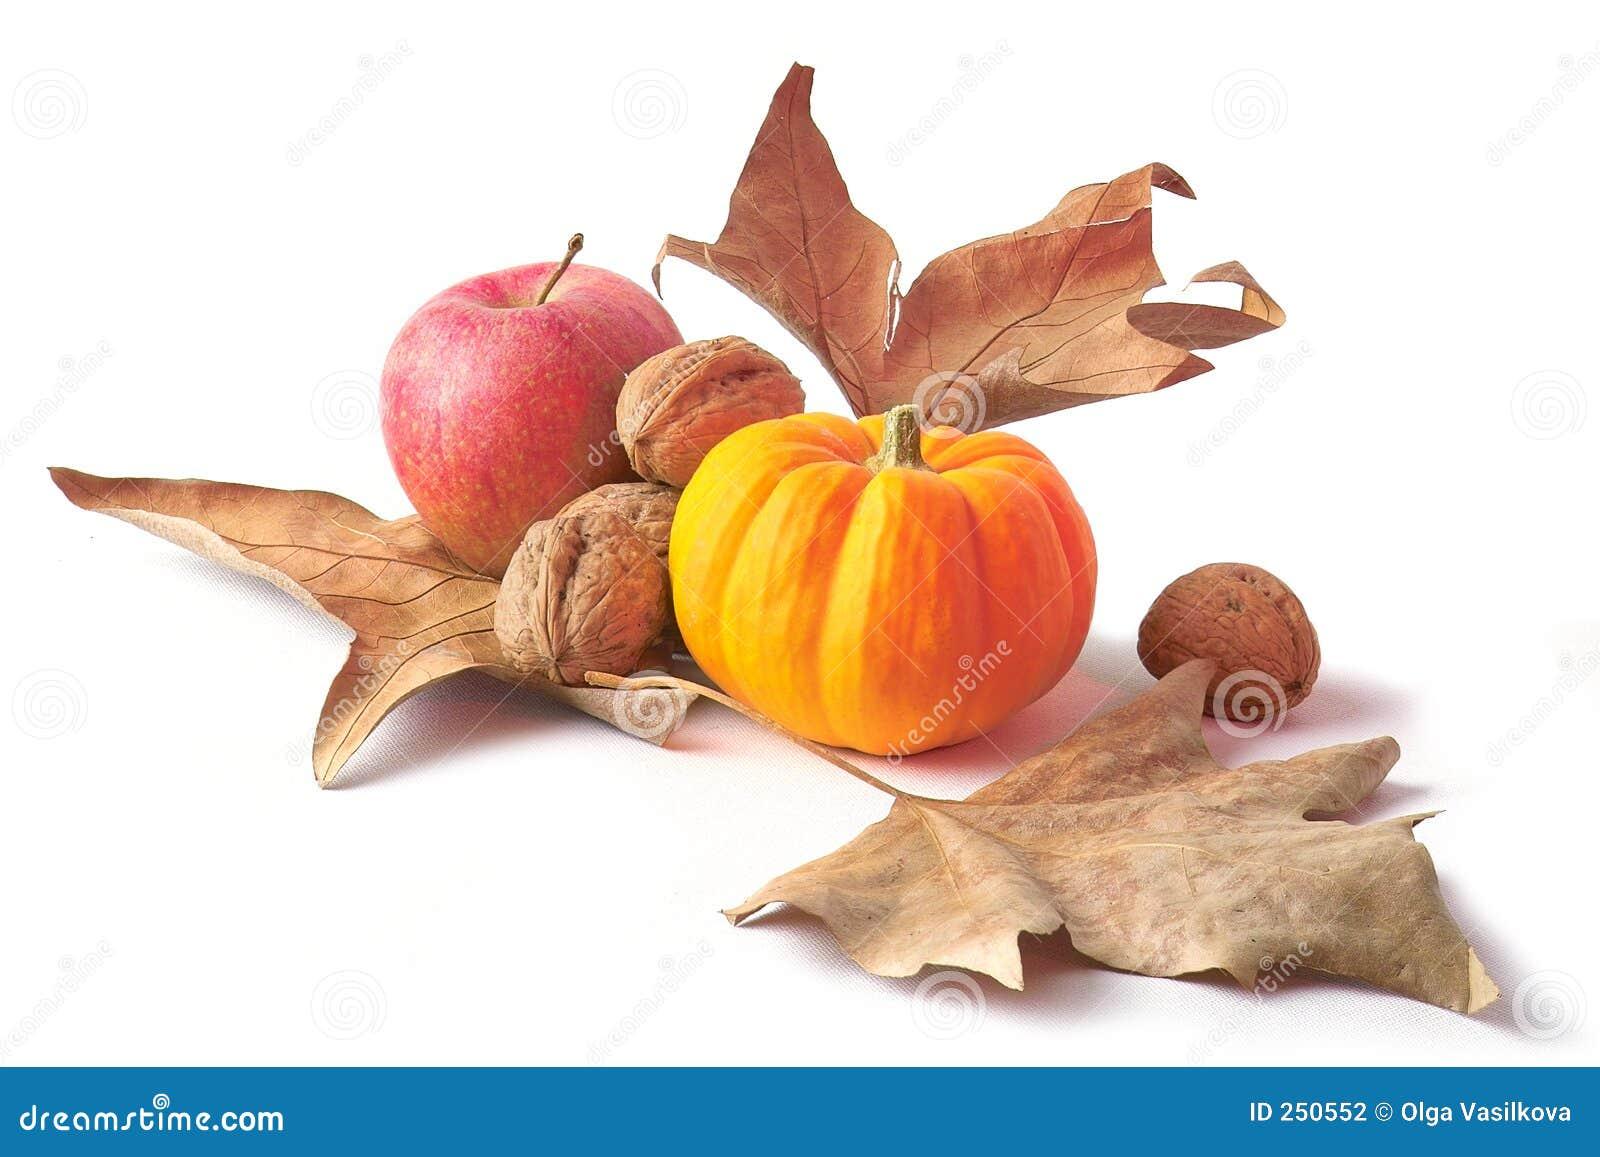 Fall Pumpkin Decoration Stock Photography - Image: 250552